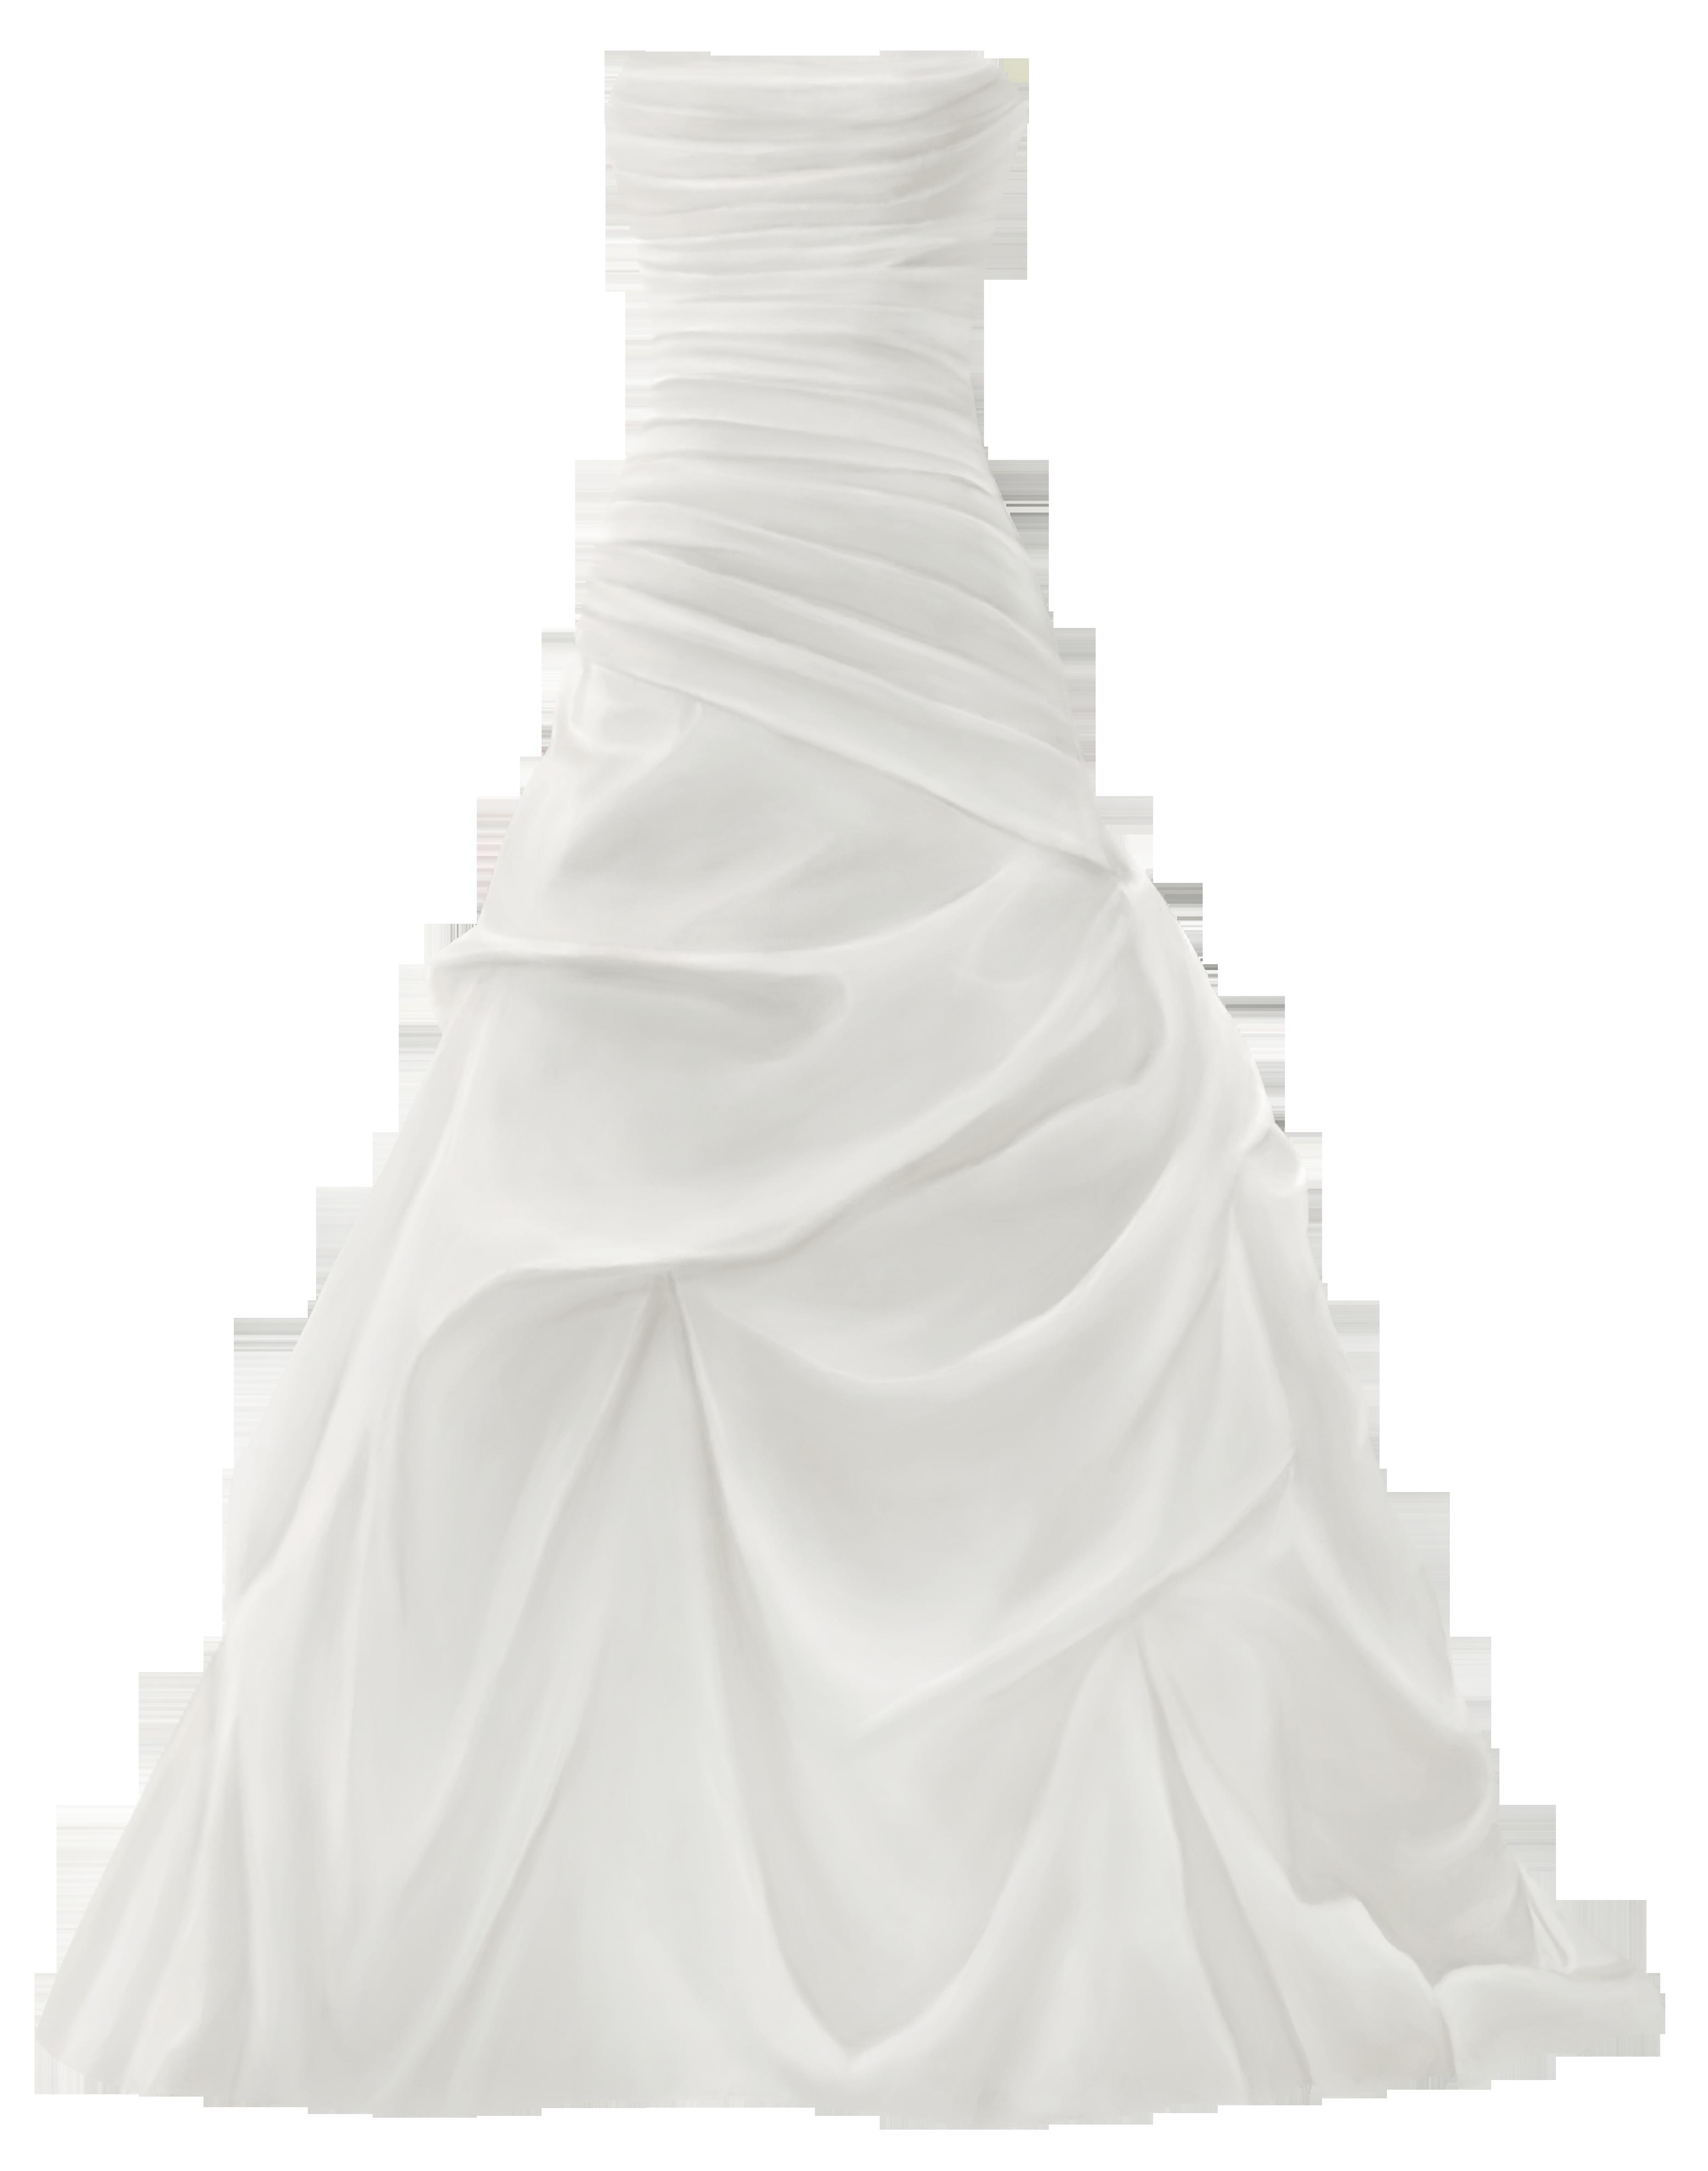 Flower girl dress clipart clip freeuse library Gown Wedding Dress PNG Clip Art - Best WEB Clipart clip freeuse library